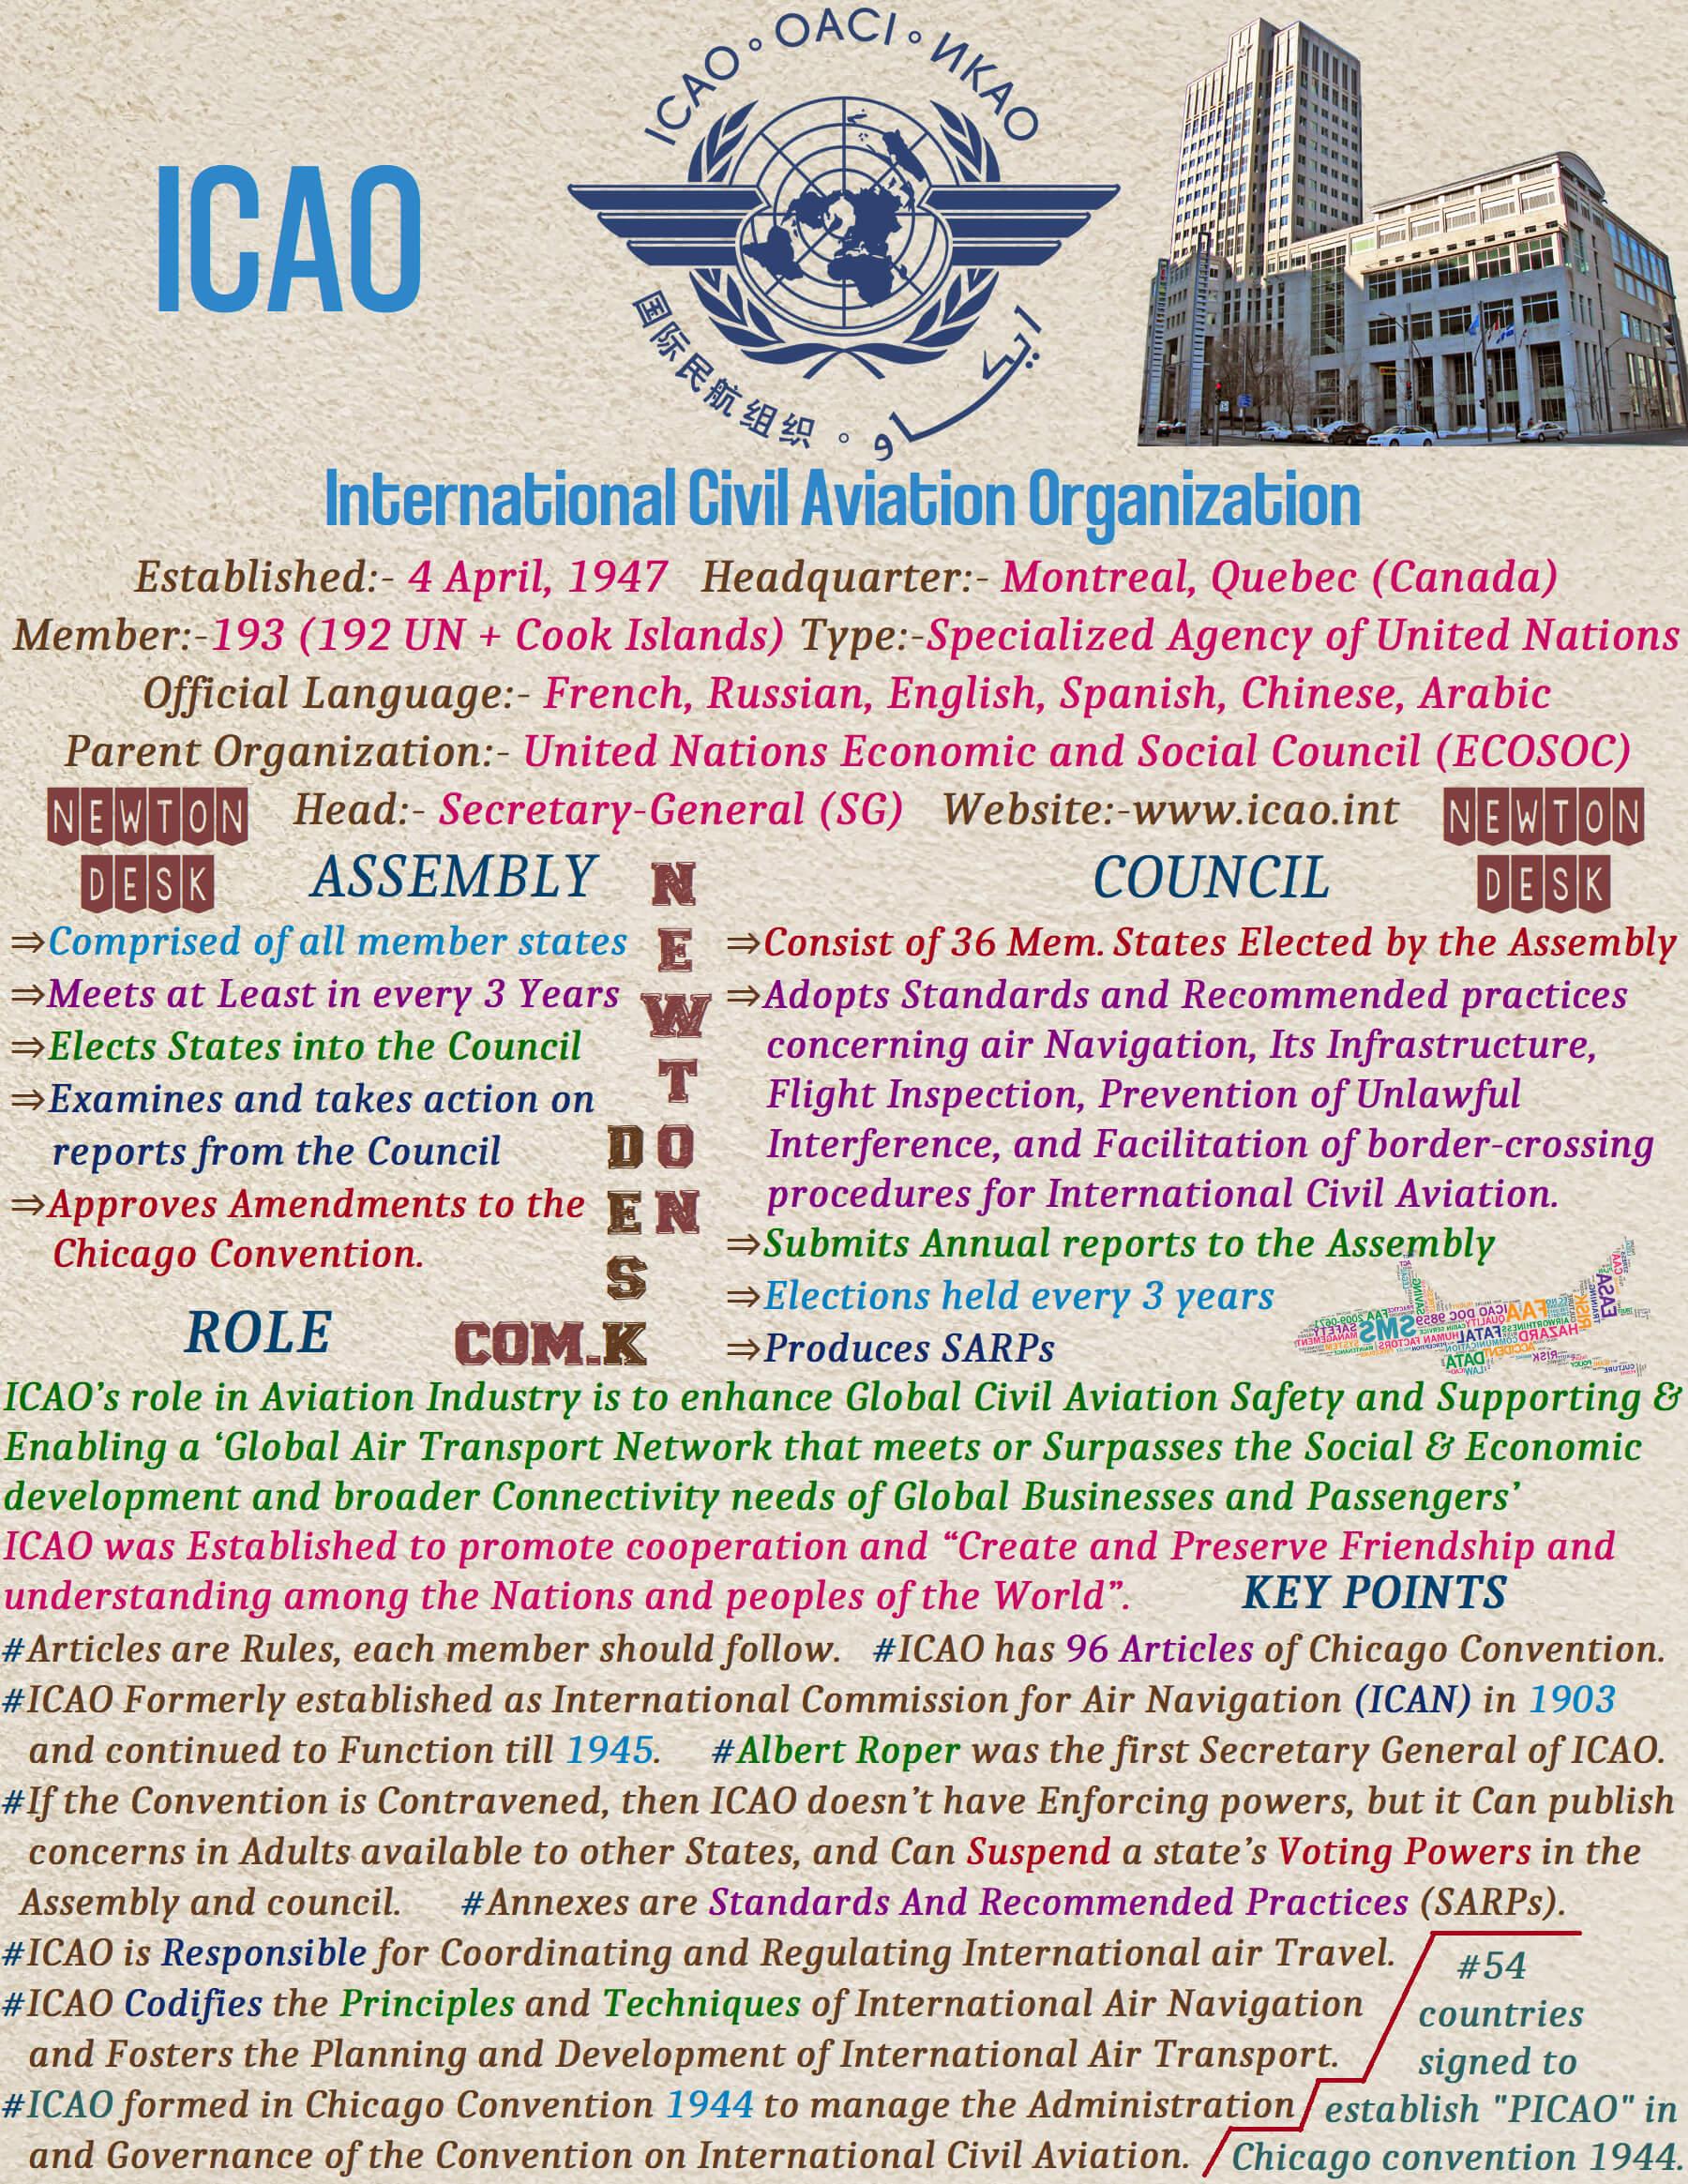 about icao international civil aviation organization